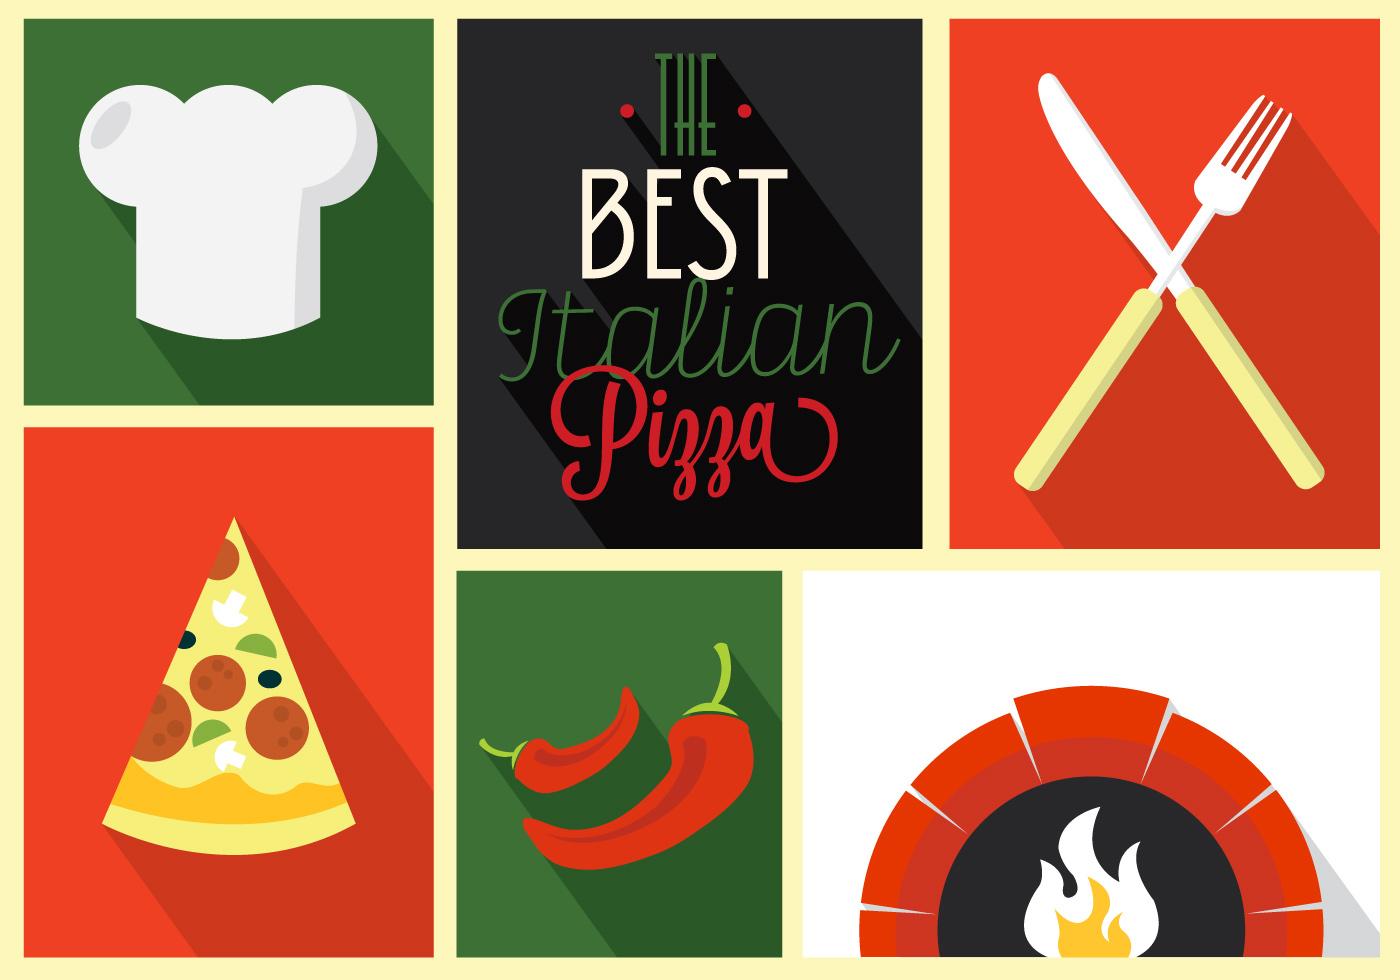 Pizza Vector Icons - Download Free Vectors, Clipart ...